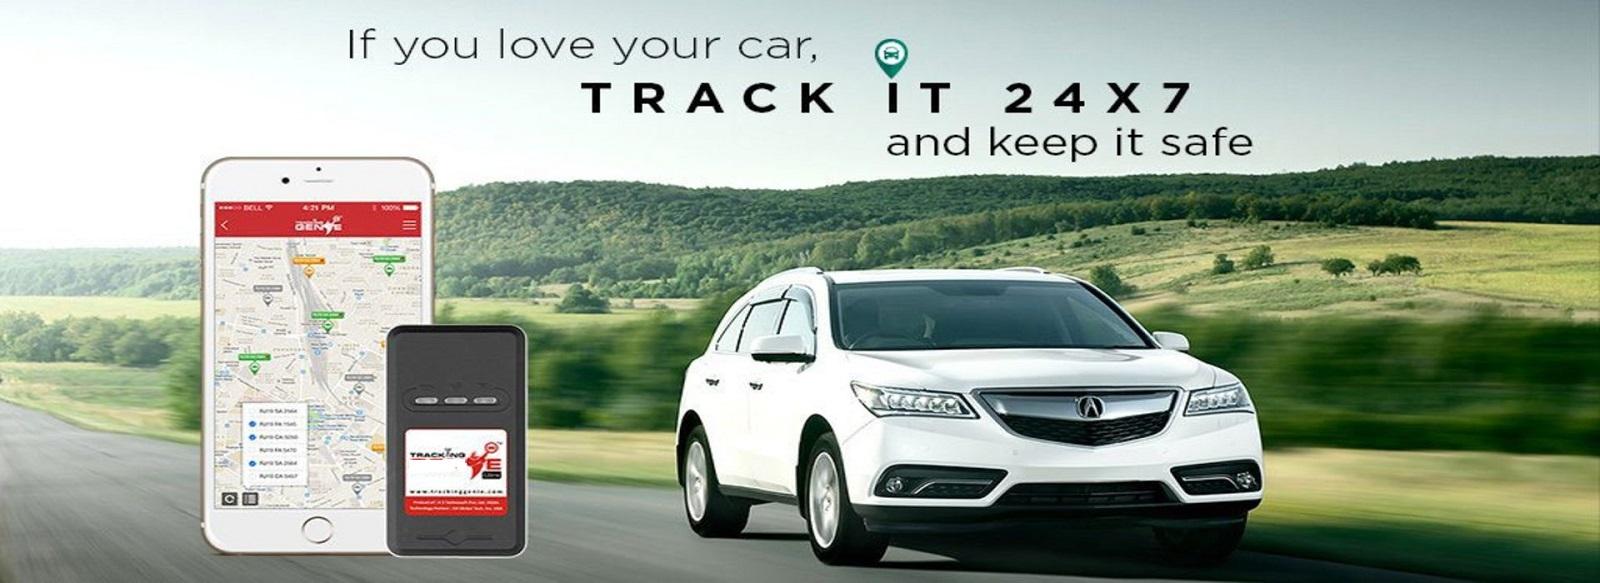 car-tracking